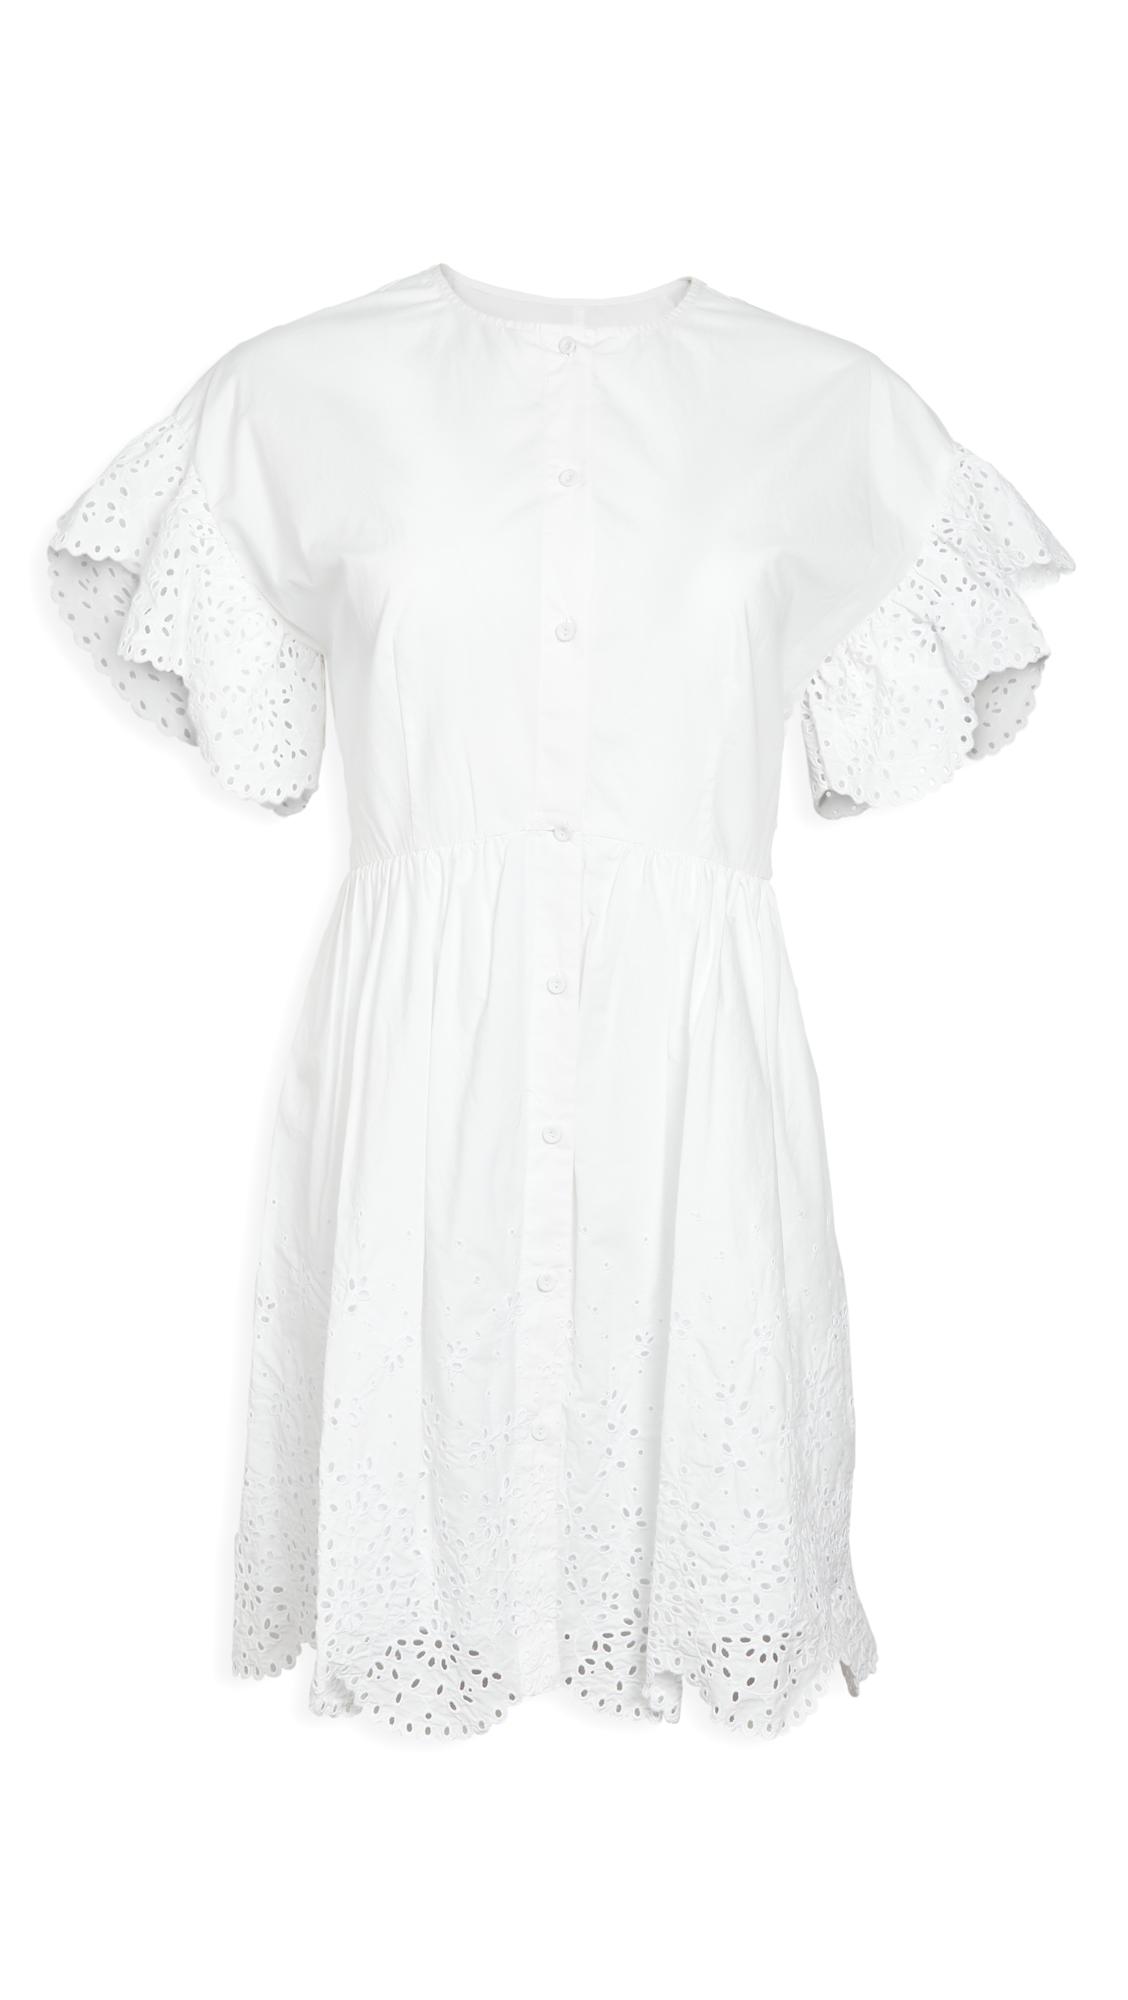 La Vie Rebecca Taylor Short Sleeve Eyelet Dress - 40% Off Sale